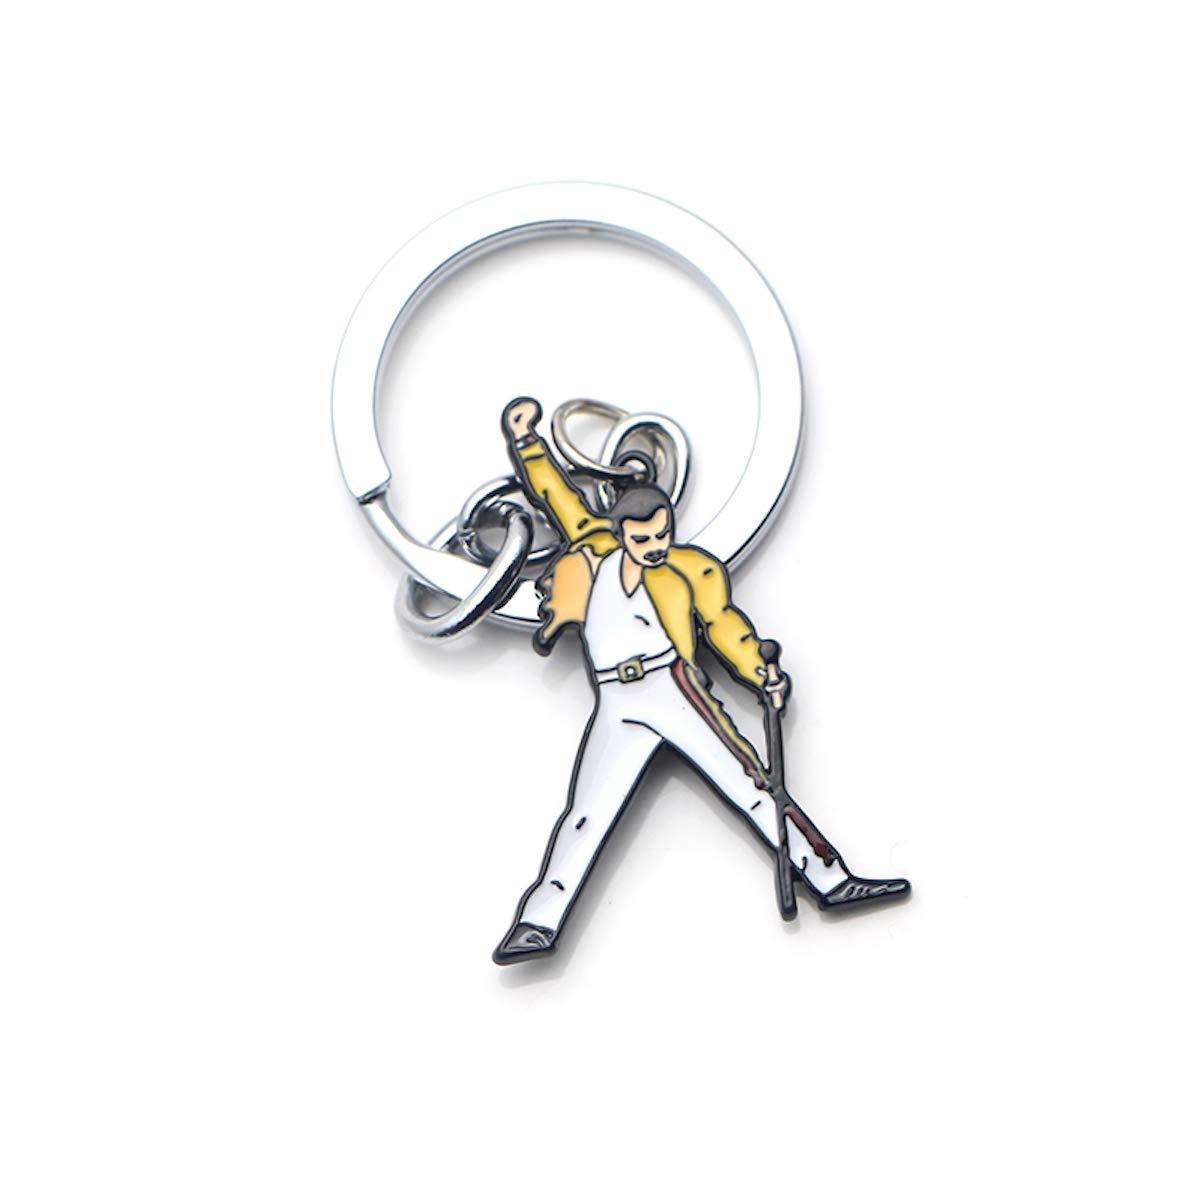 Freddie Mercury Keychain//Rock Music Legends Keychain//LGBTQ Keychain//Custom Keychain//Queen Keys Keychai n